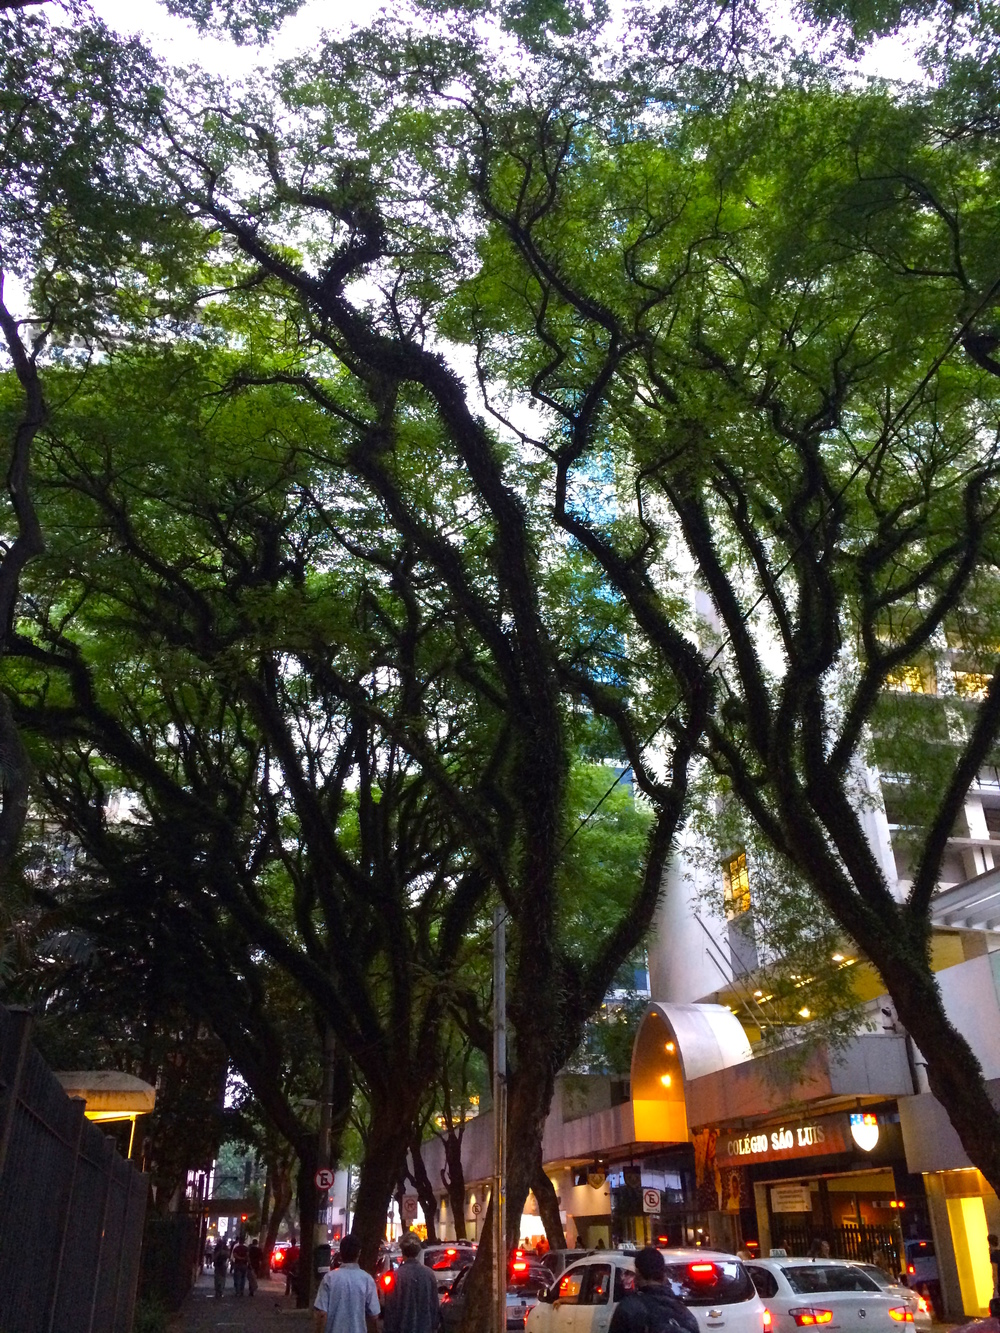 Trees in Sao Paulo